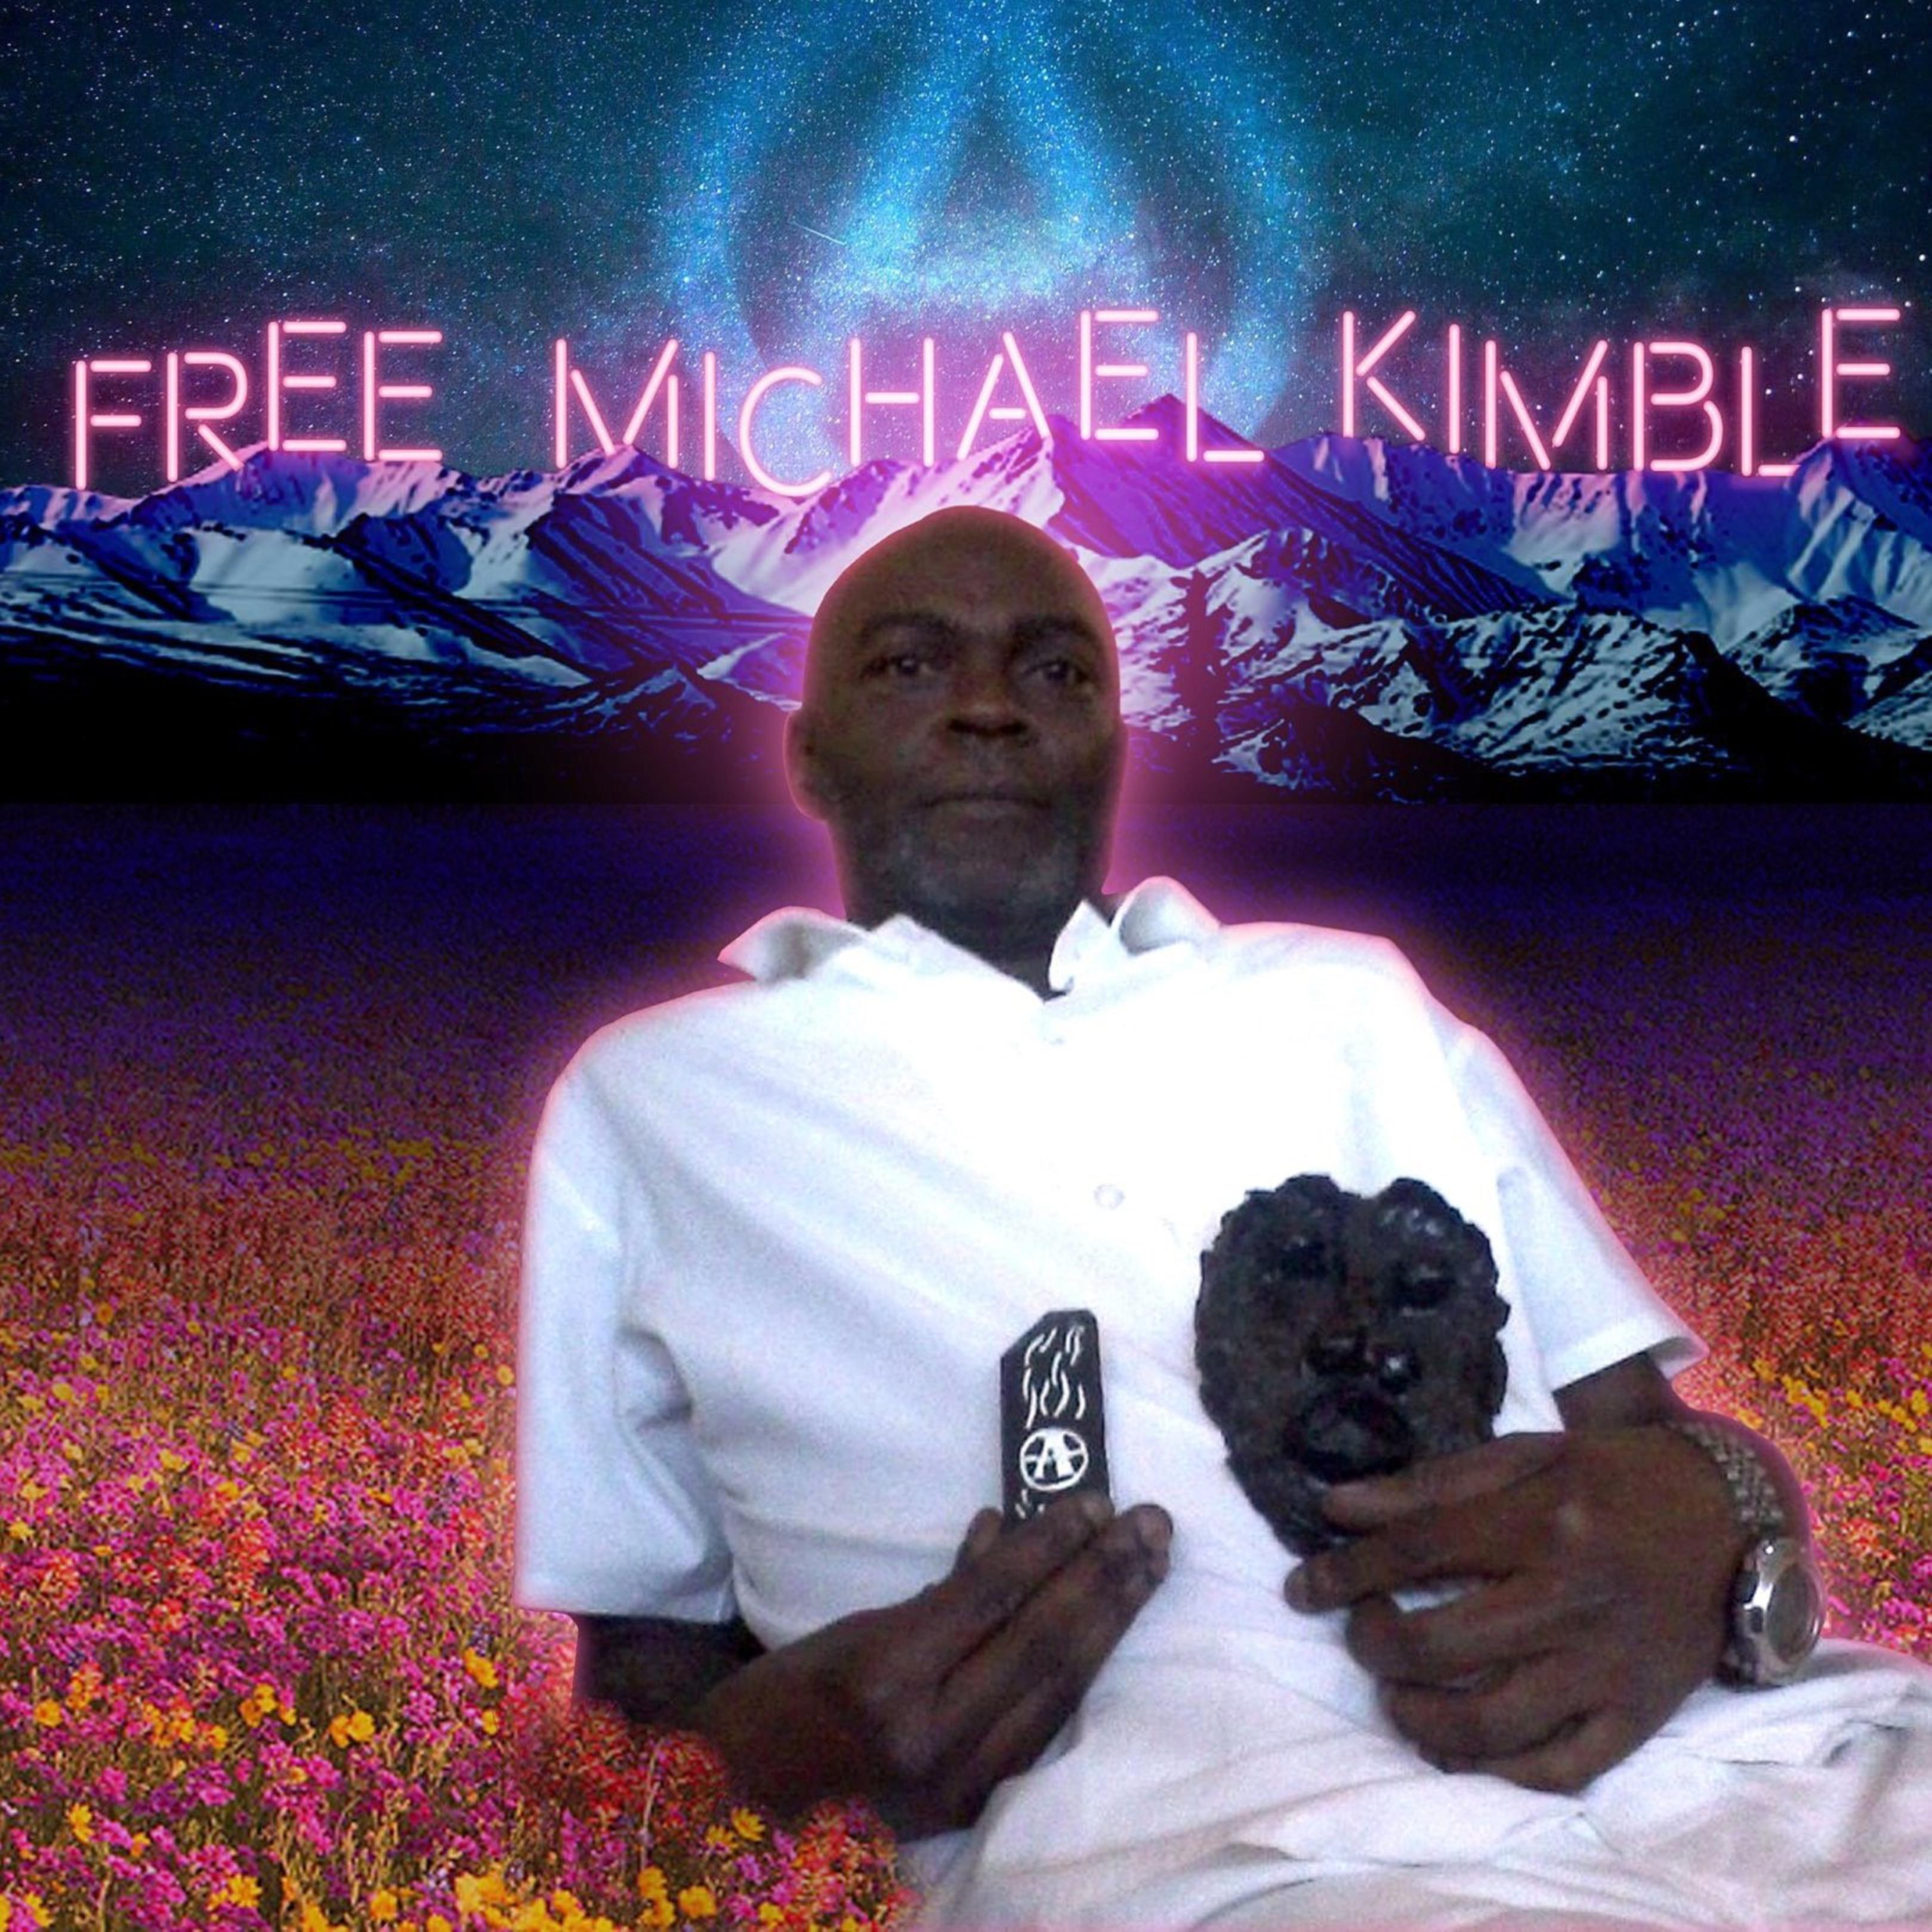 Monday, 1/27: Letter-writing to Michael Kimble